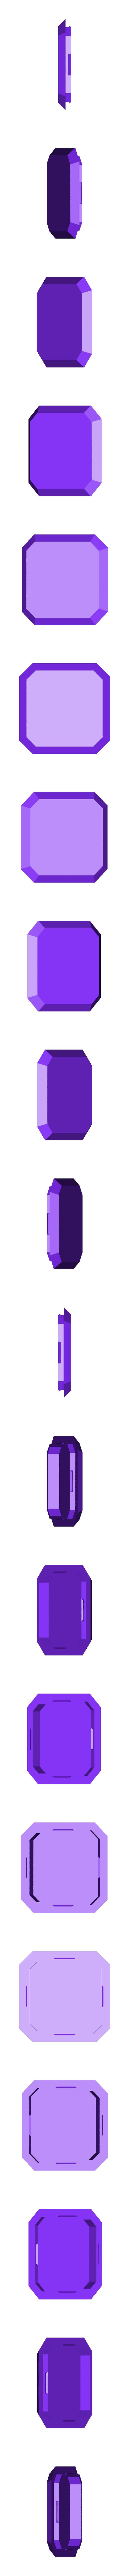 ttc-side-logo-A.stl Download free STL file Time Tracking Cube • 3D print design, Adafruit